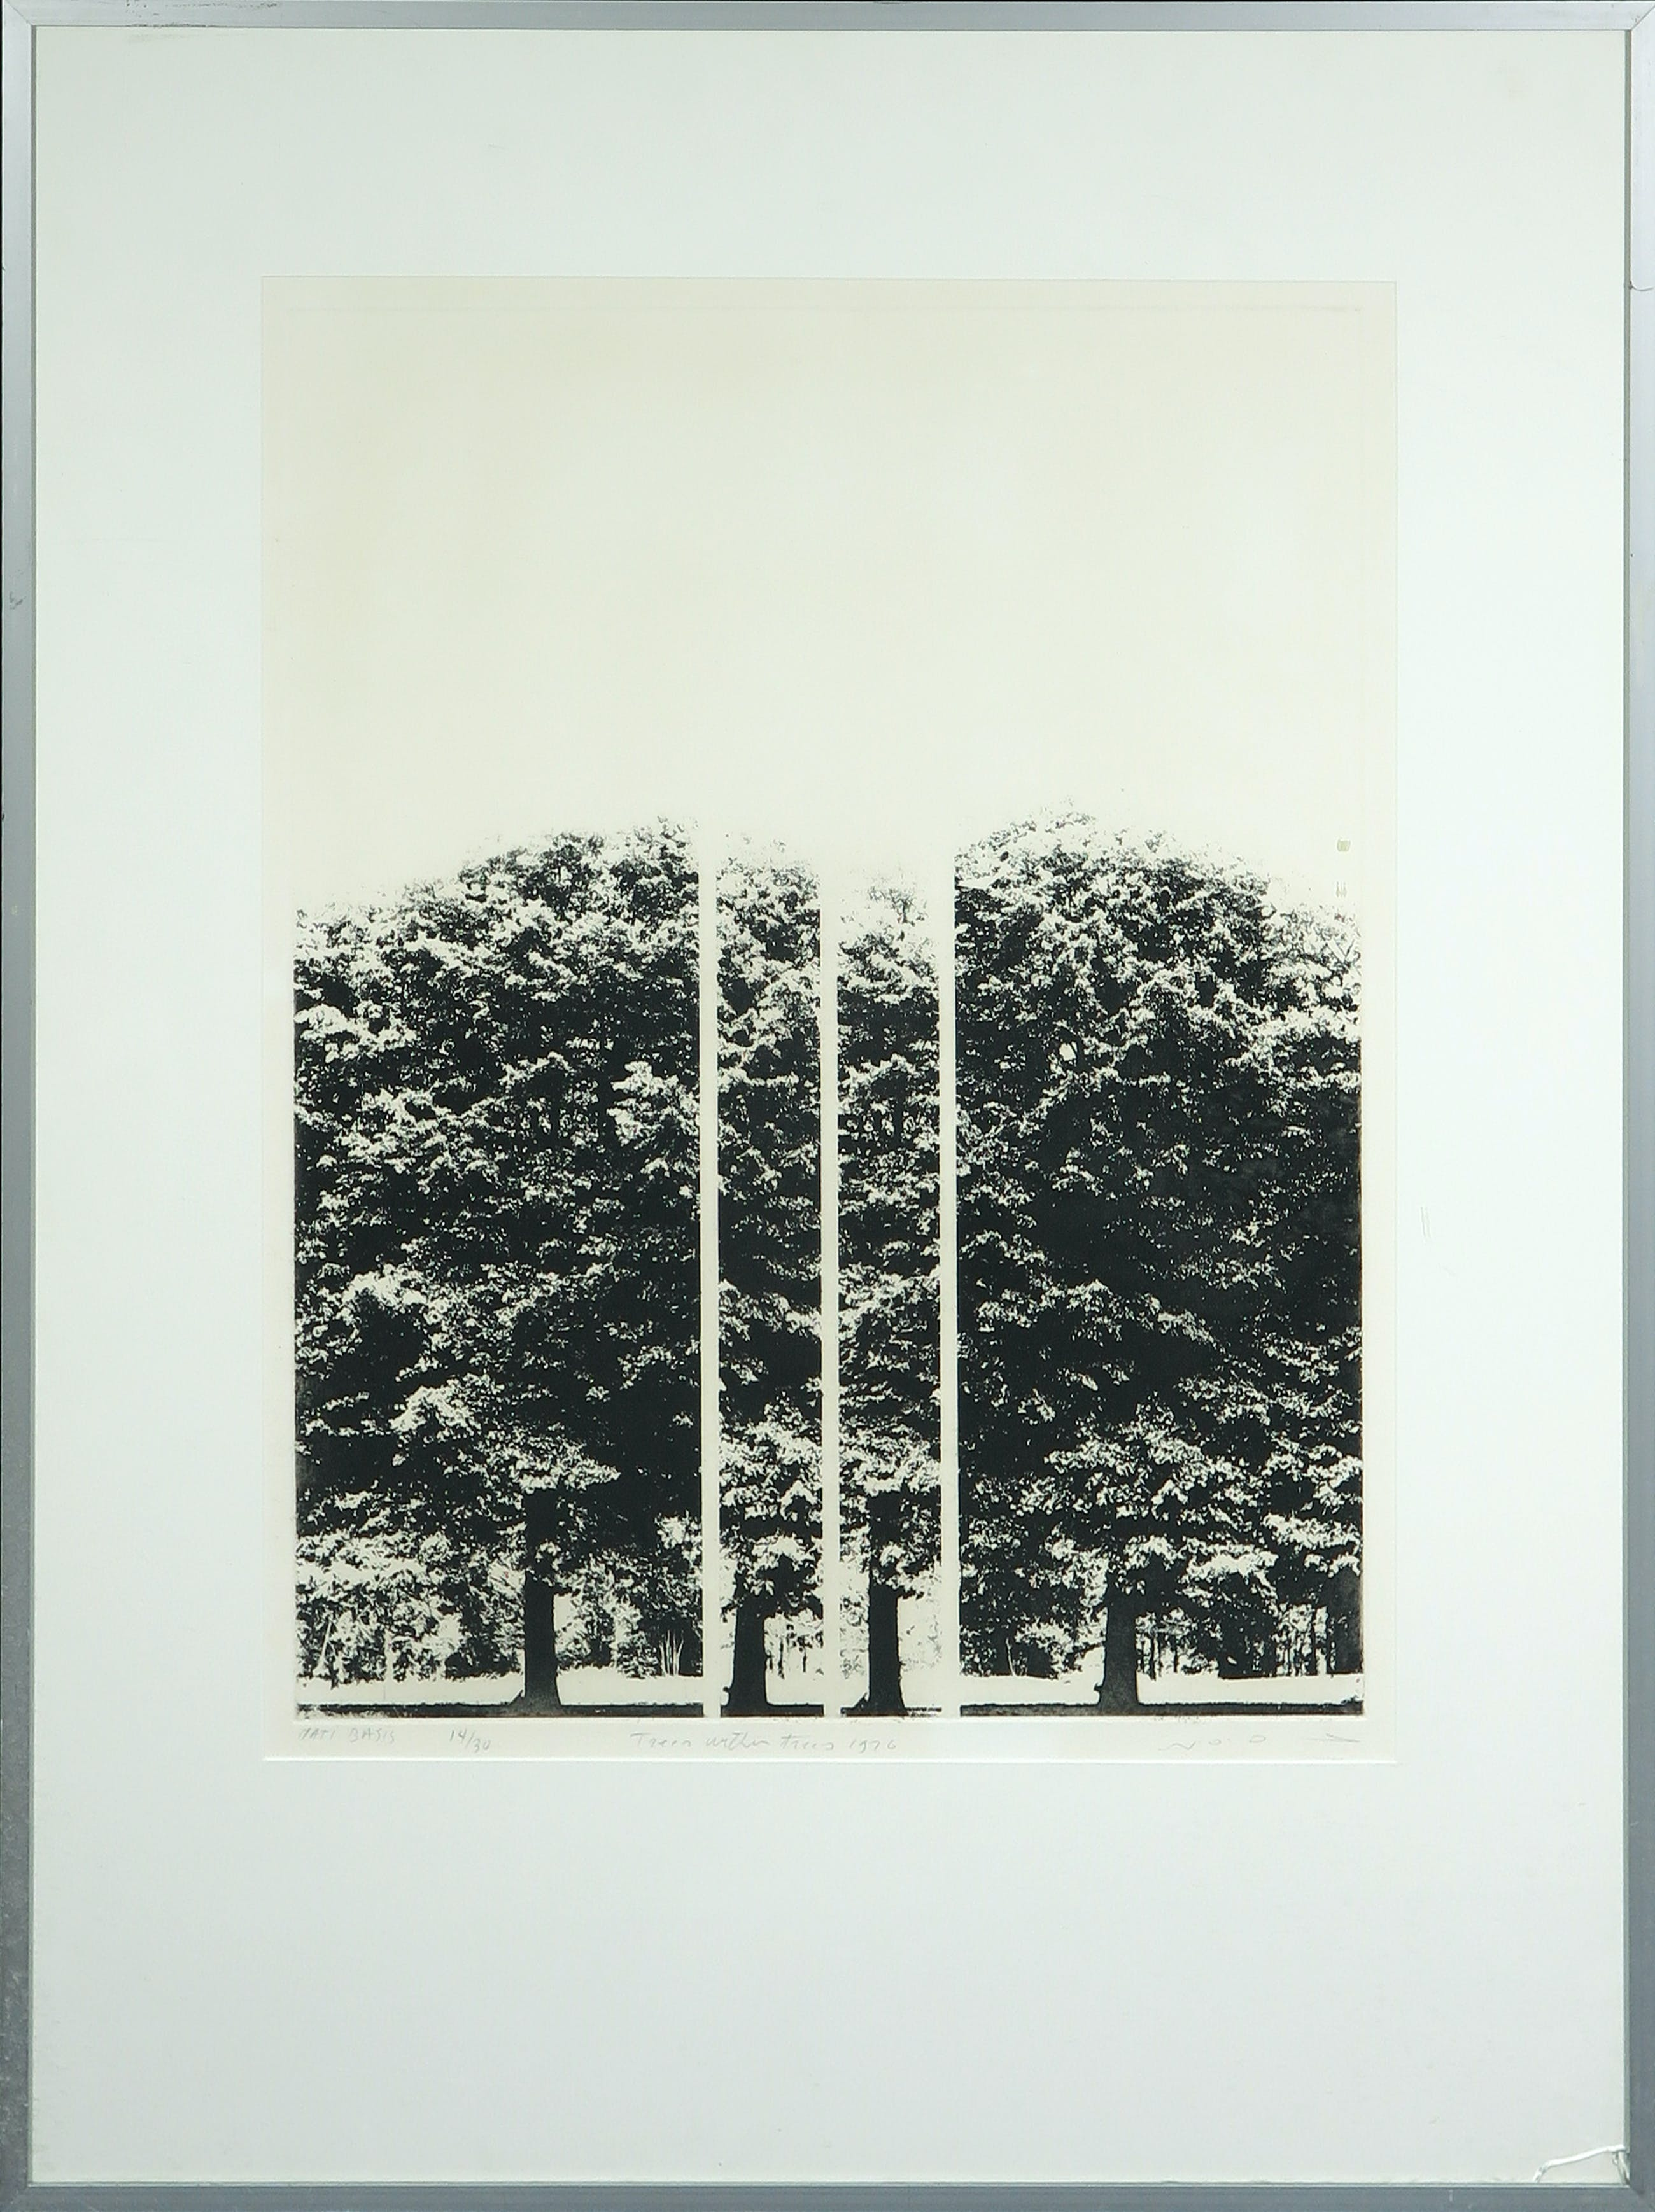 Matti Basis - Ets, Trees within trees - Ingelijst kopen? Bied vanaf 50!